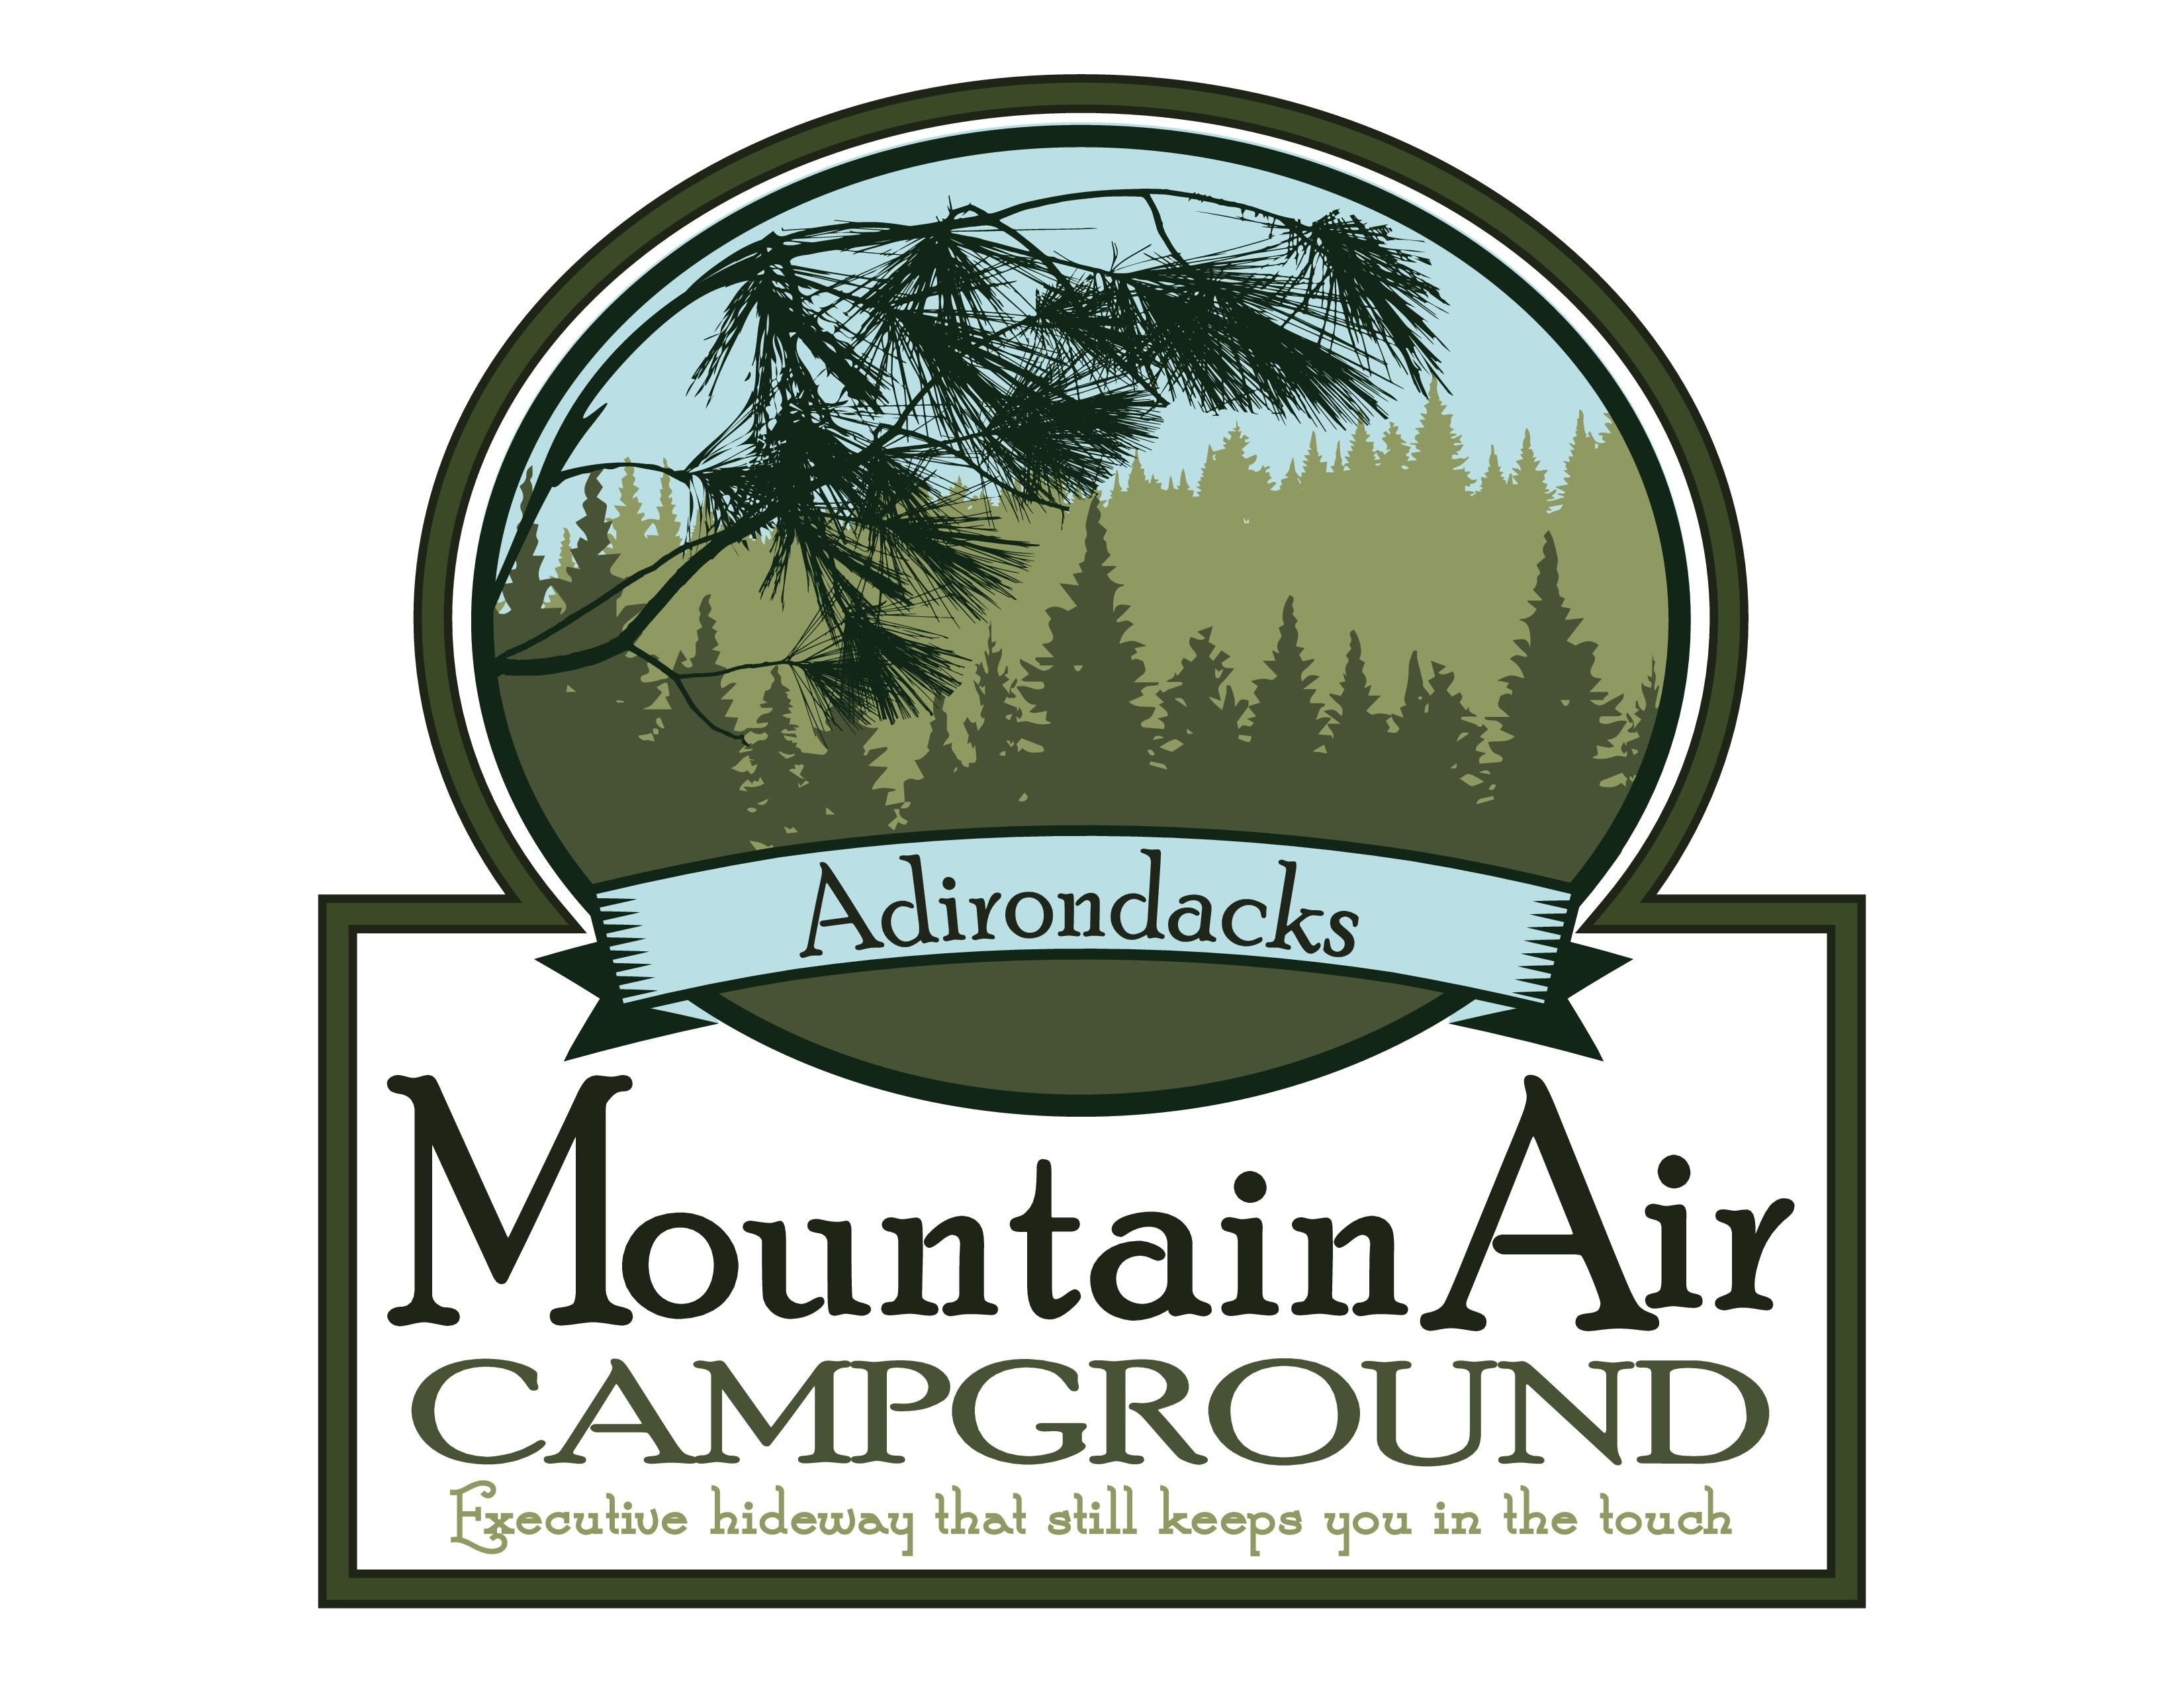 Mountain Air Campground